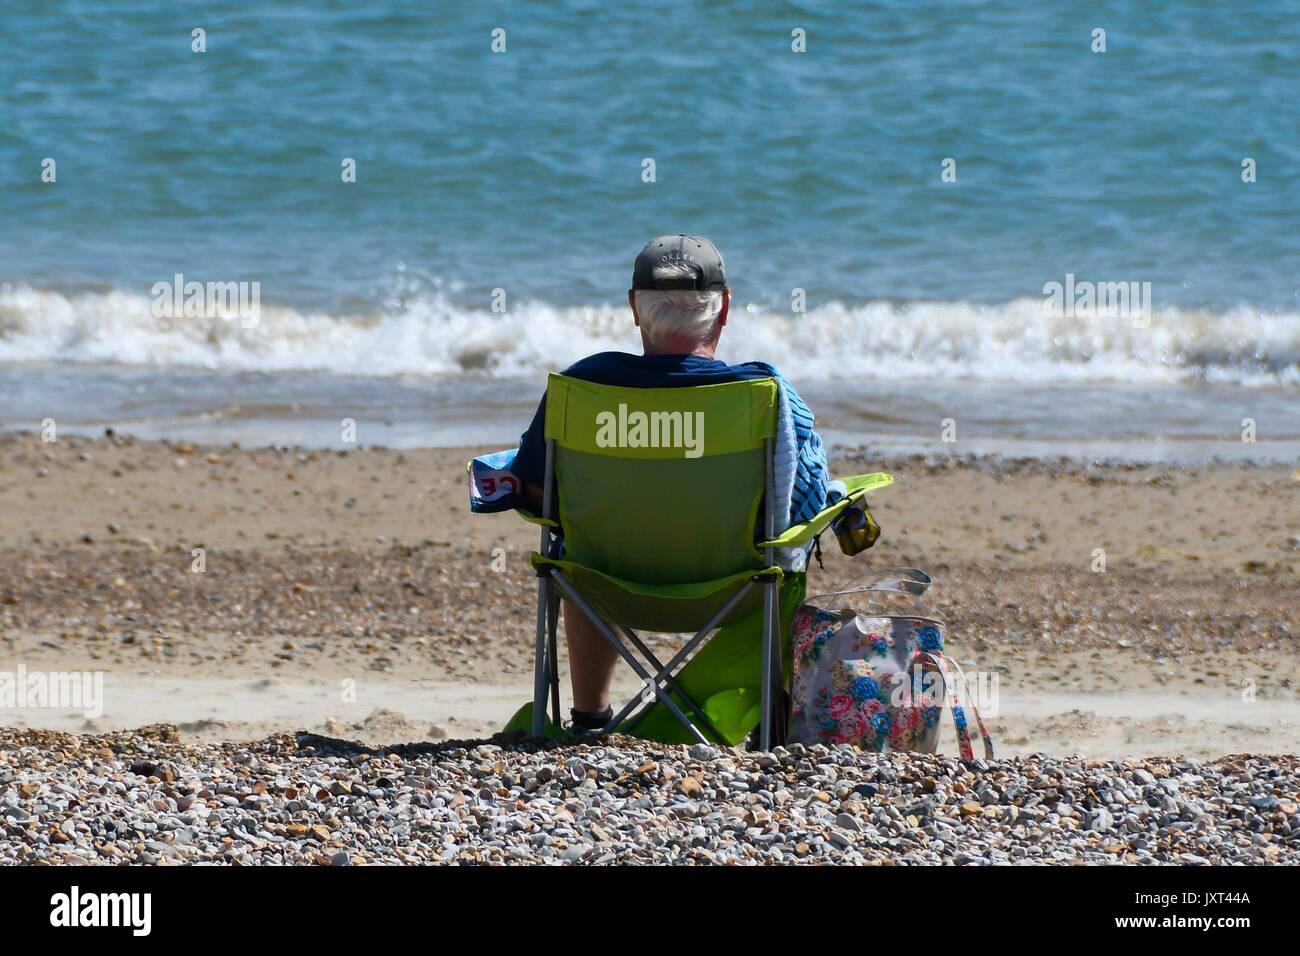 Weymouth, Dorset, UK. 17th Aug, 2017. UK Weather. Holidaymaker on the beach enjoying the warm sunny weather at the Stock Photo